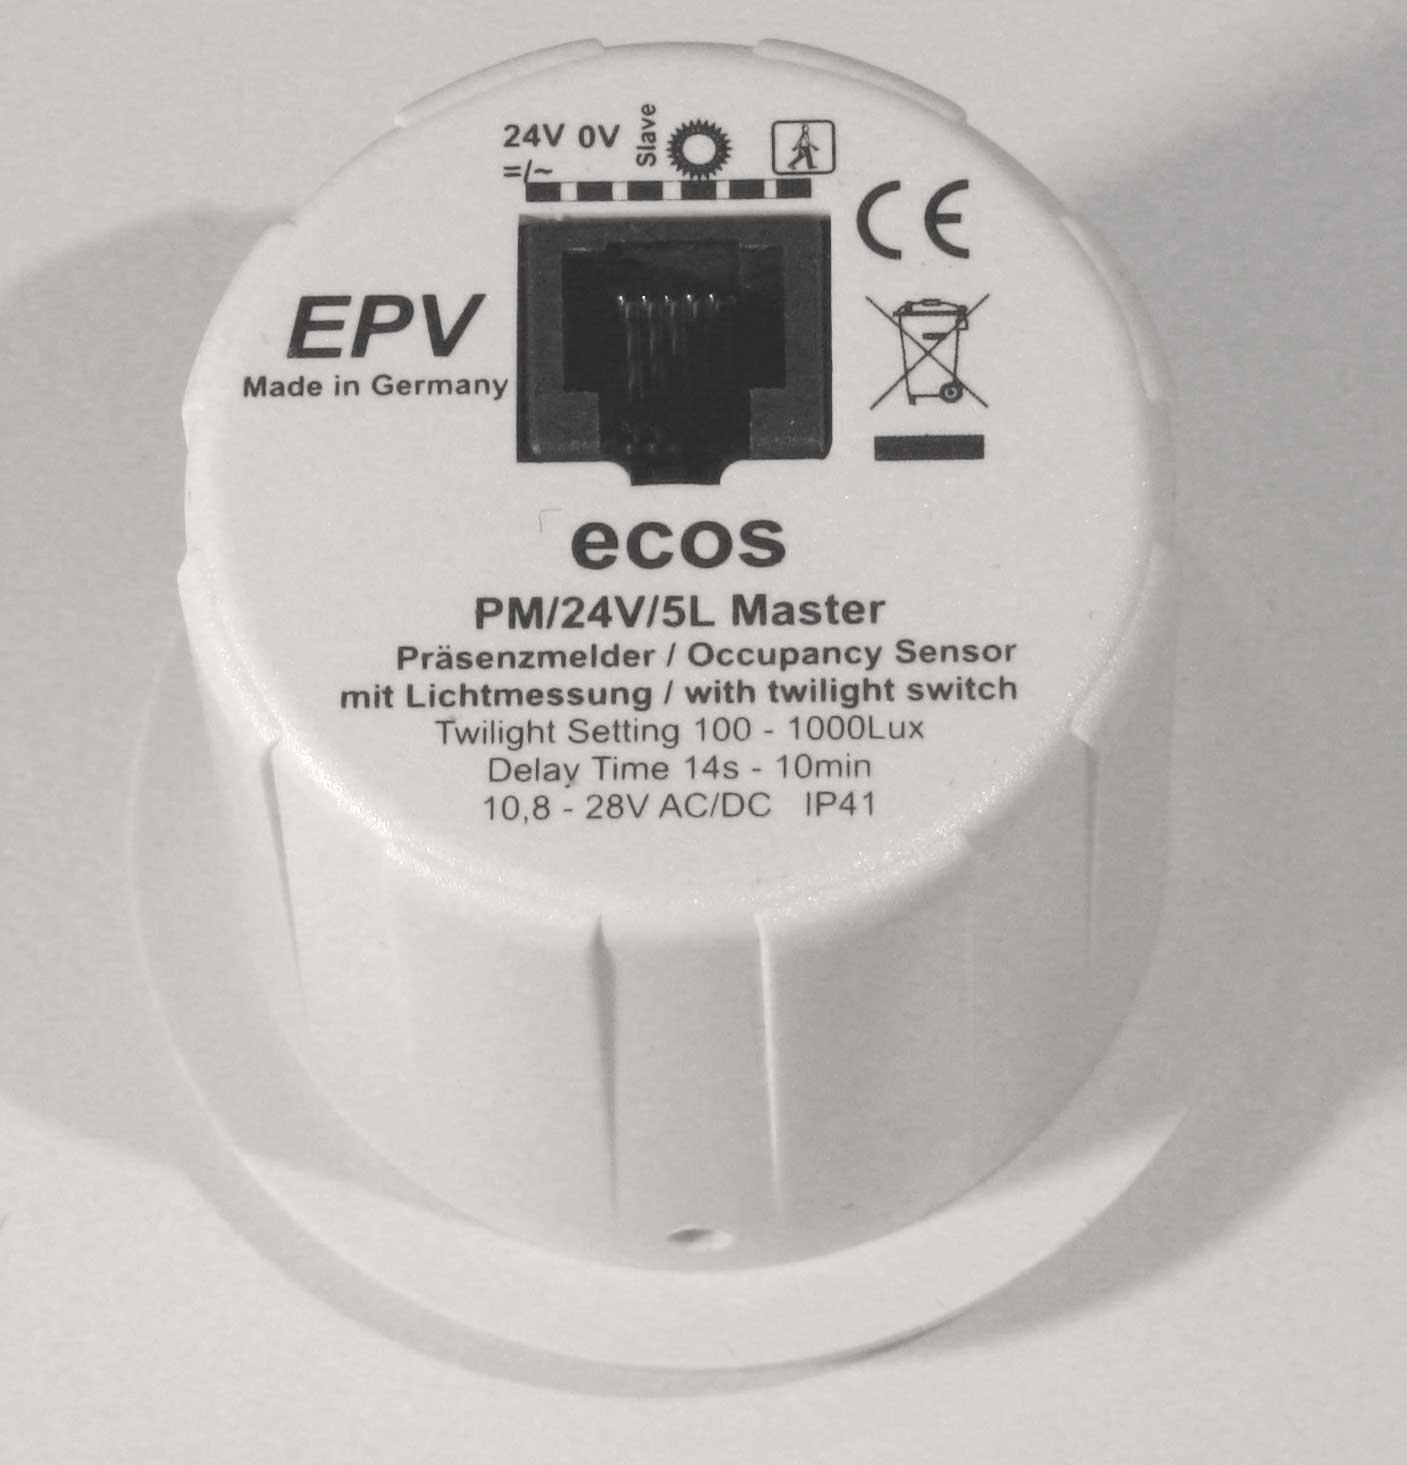 ecos 24V Rückansicht